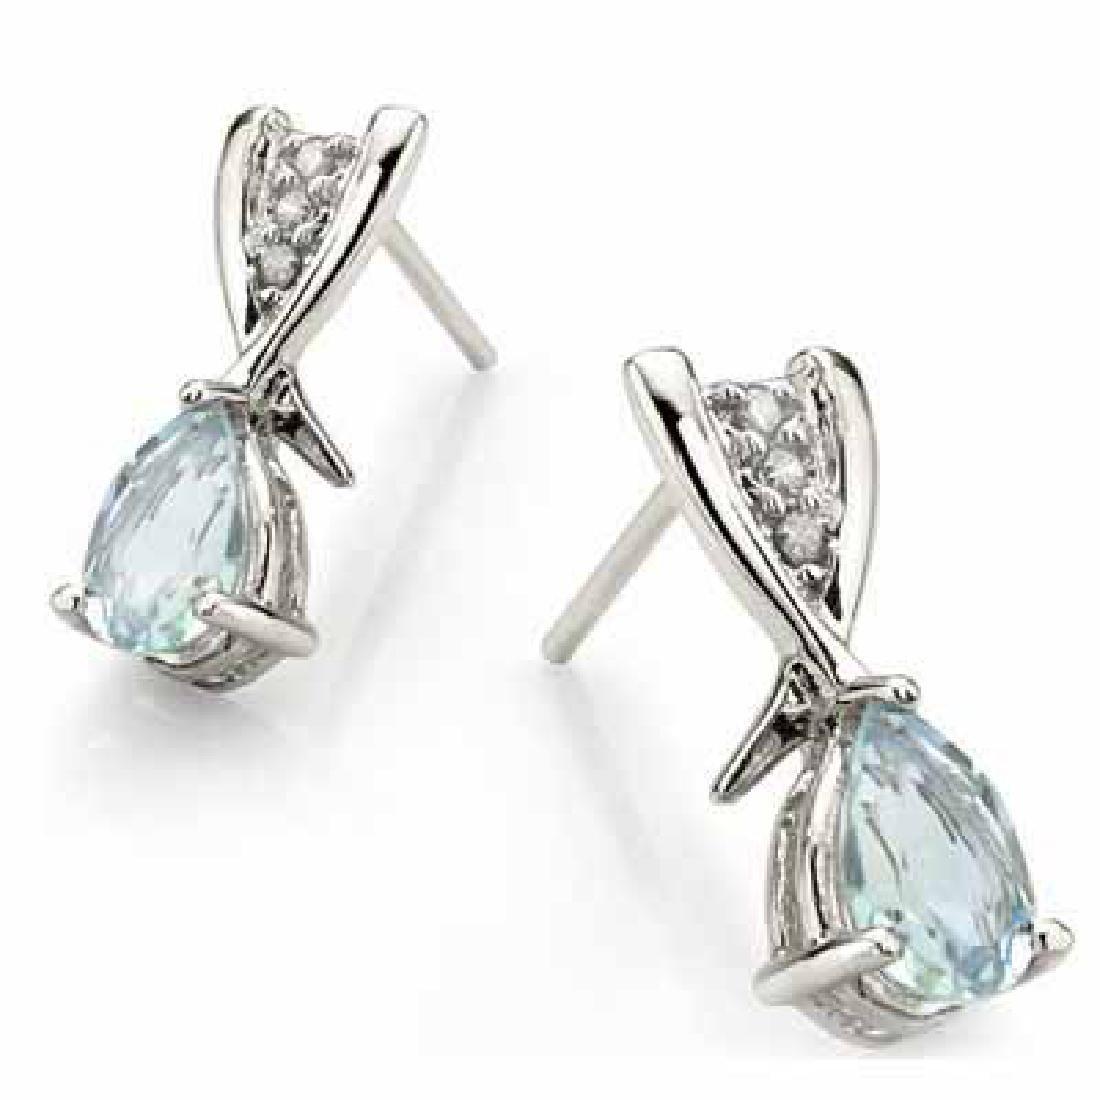 2/3 CARAT AQUAMARINE & DIAMOND 925 STERLING SILVER EARR